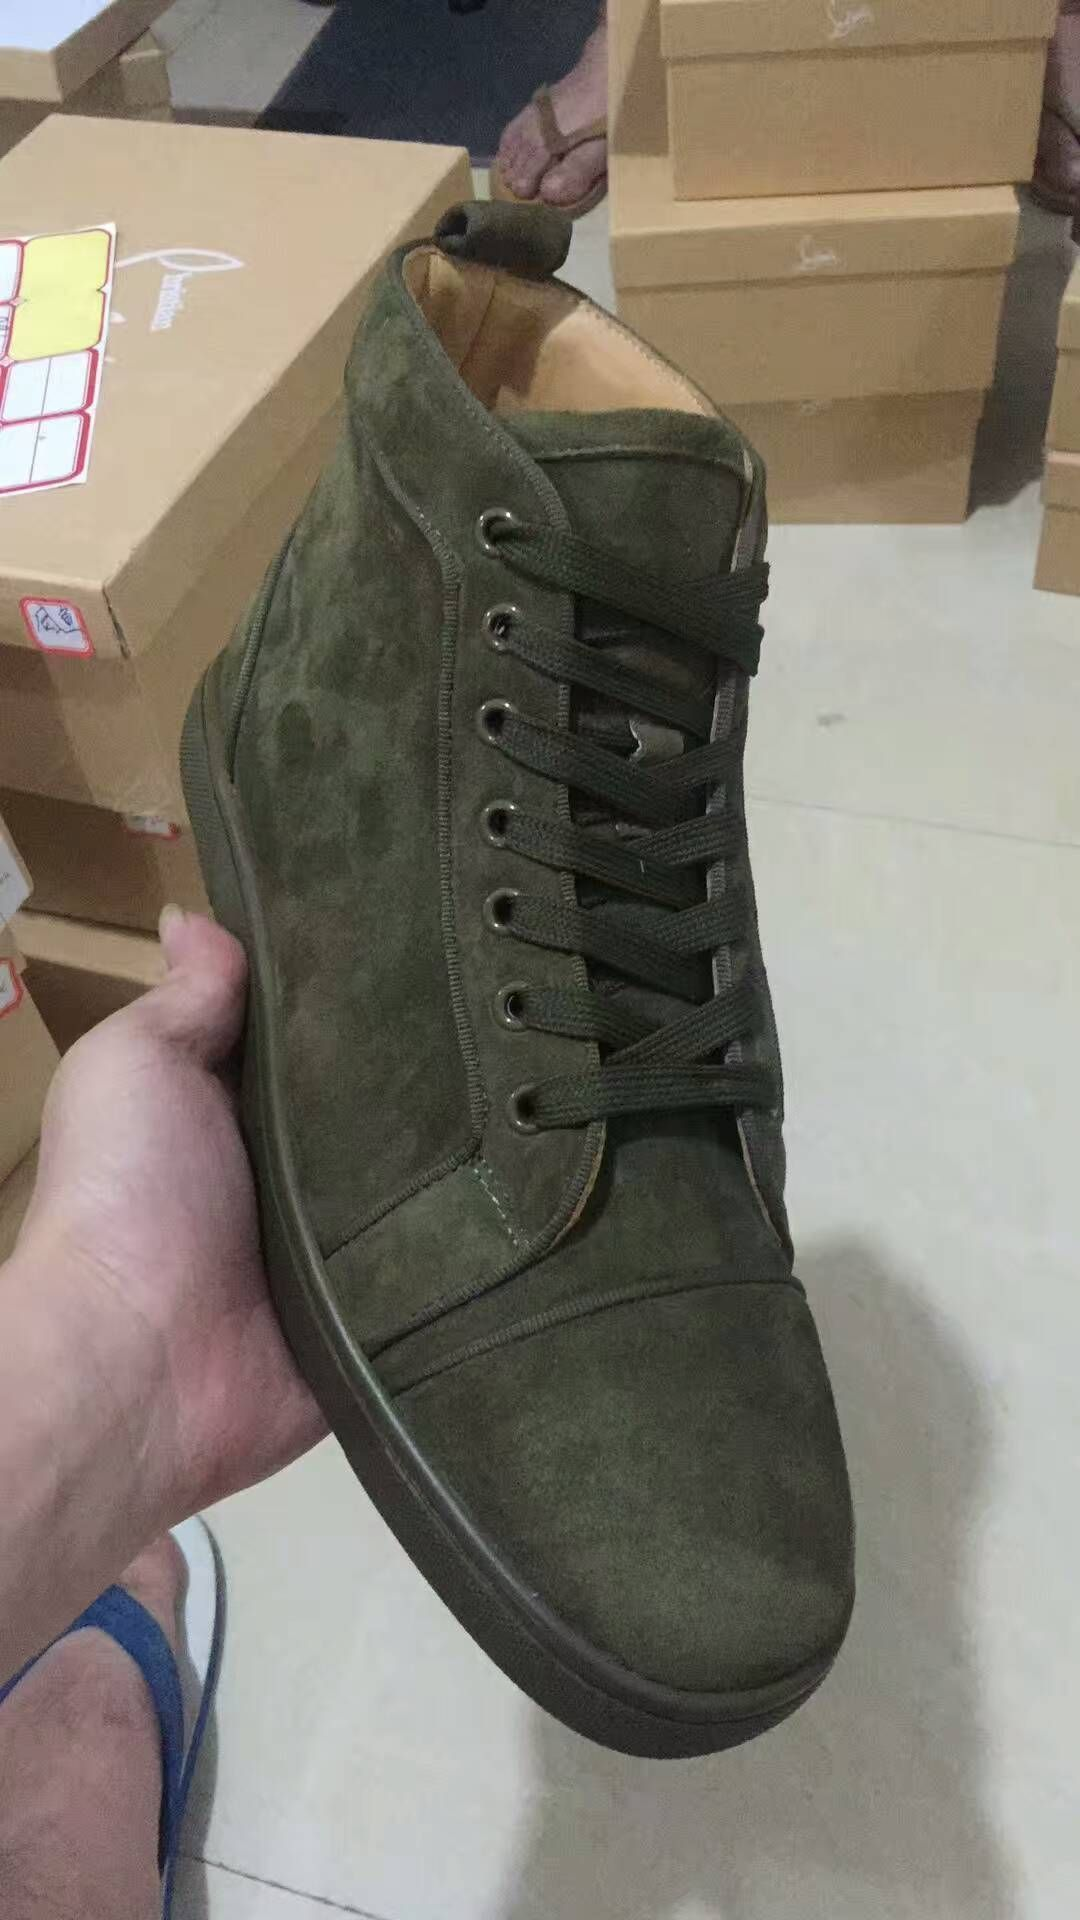 6a1942e2973c christian louboutin green suede high sneakers  christianlouboutinsneakers